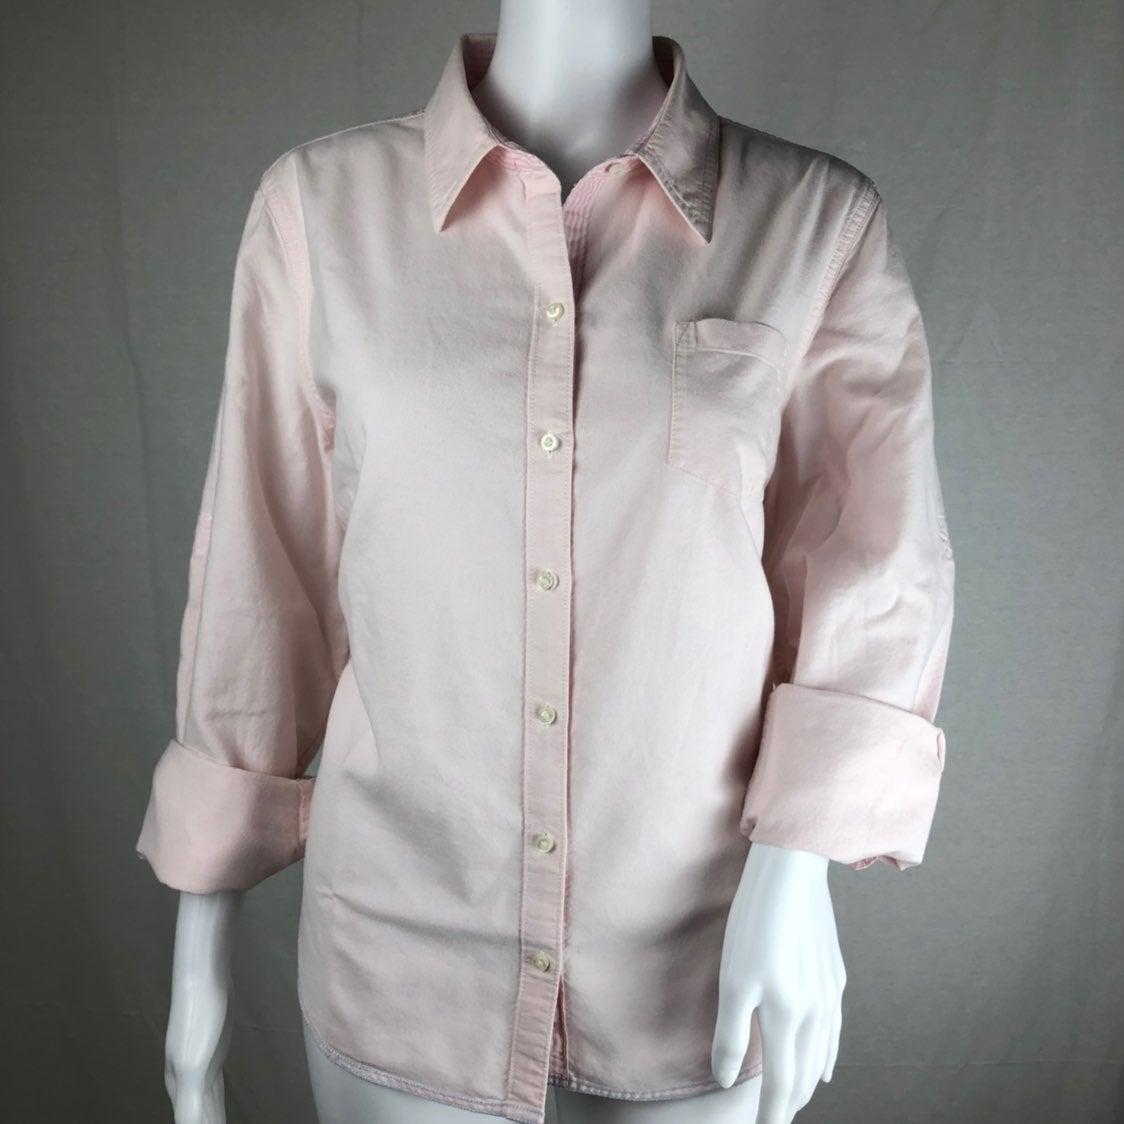 Tommy Hilfiger Pale Pink Button Down